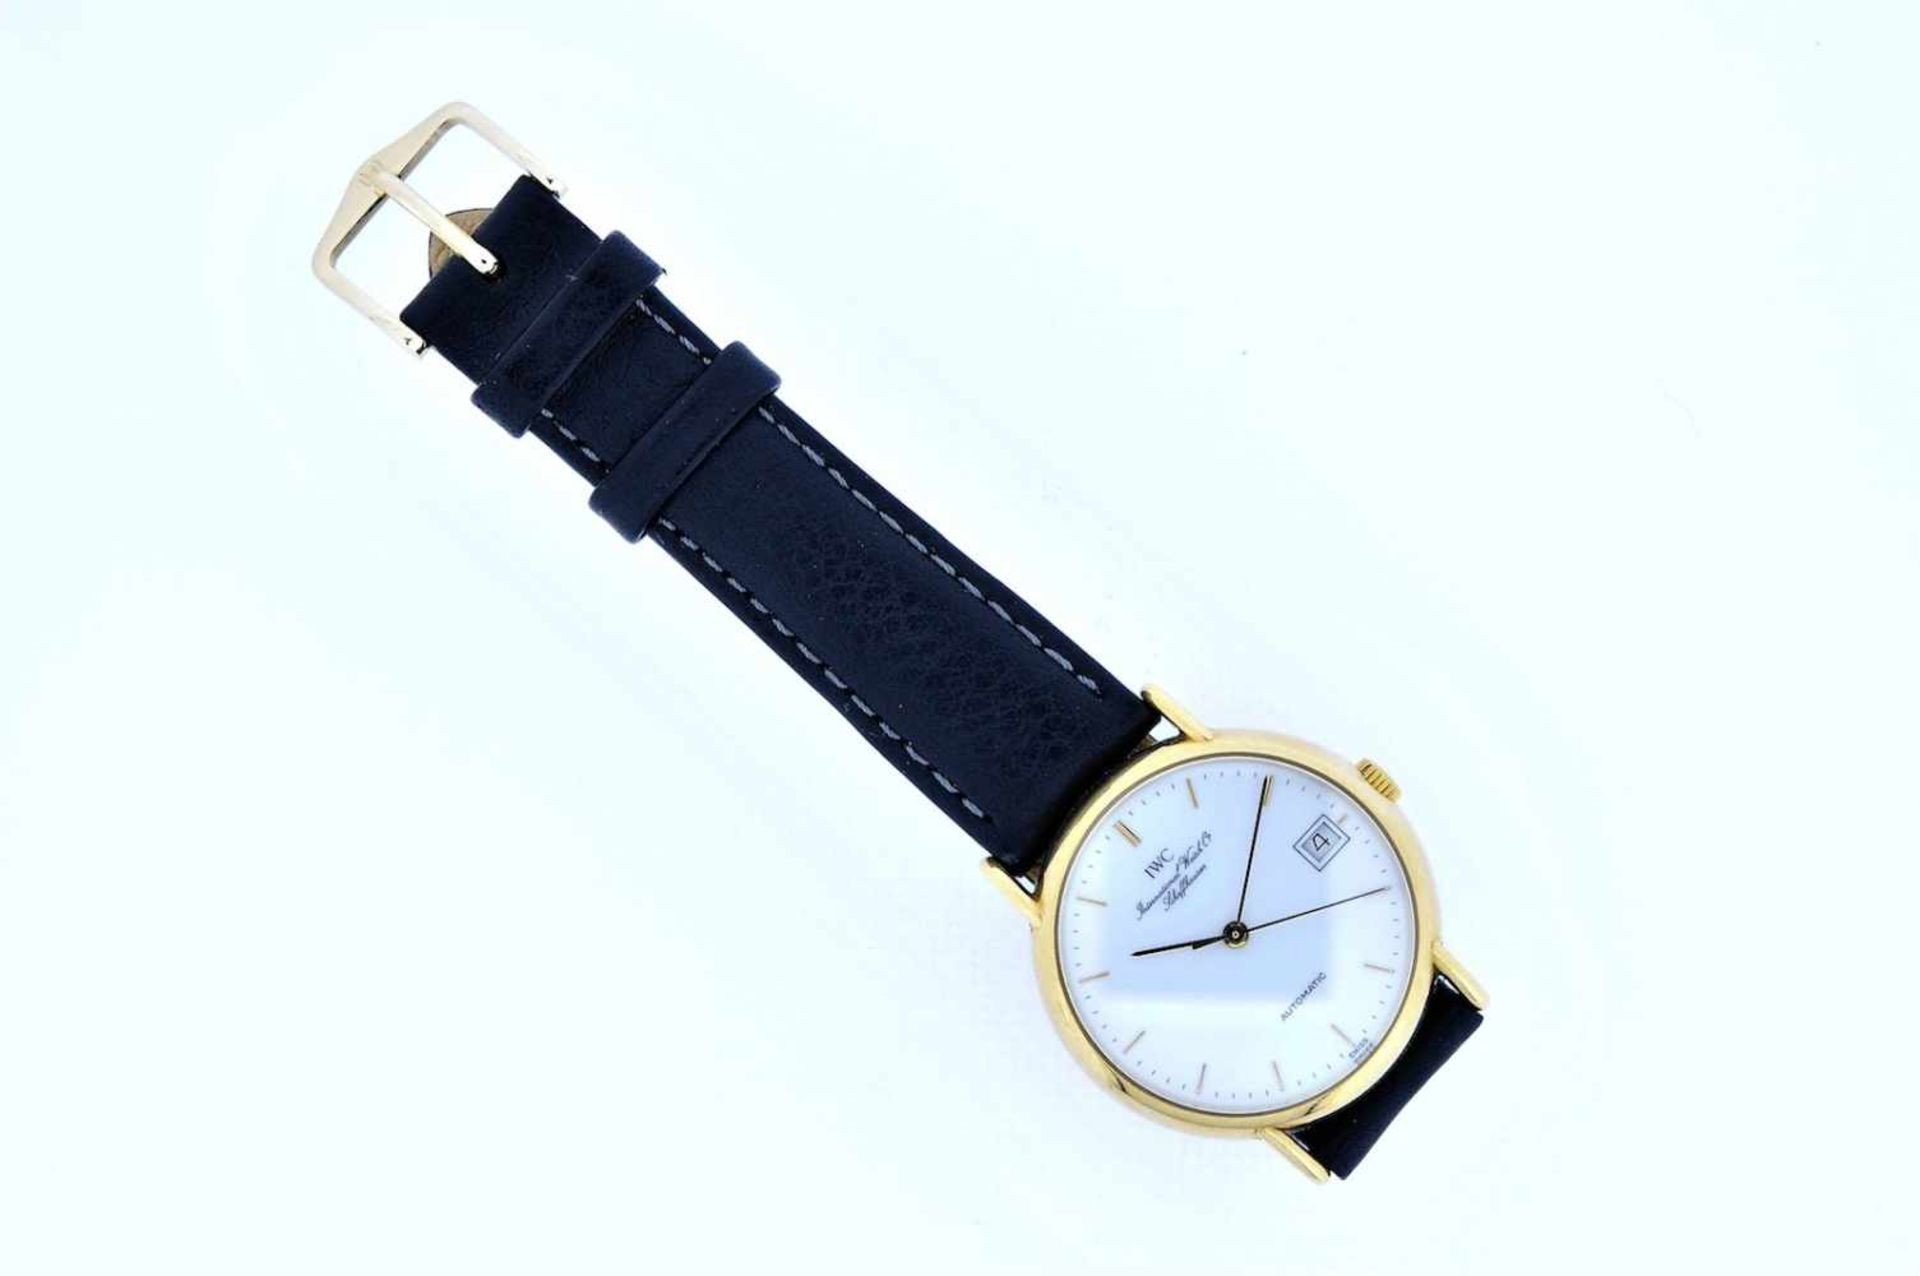 IWC Goldene 18karätige Armbanduhr an Lederband, IWC, Automatik, zentrale Sekunde, Ankerwerk,